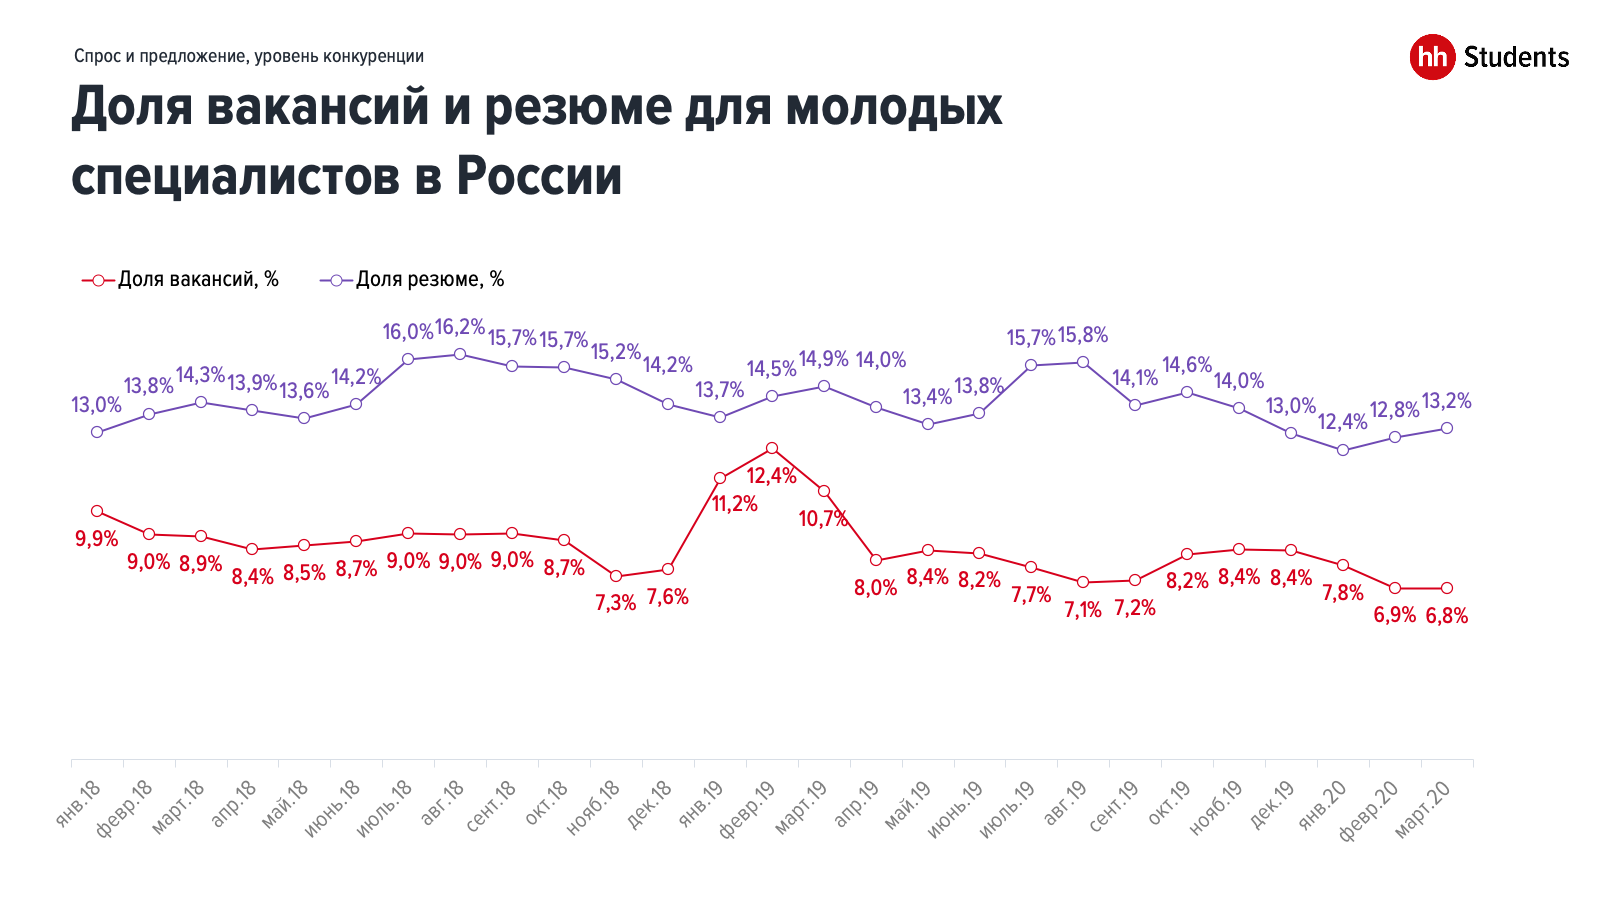 Рынок труда молодых специалистов накануне кризиса